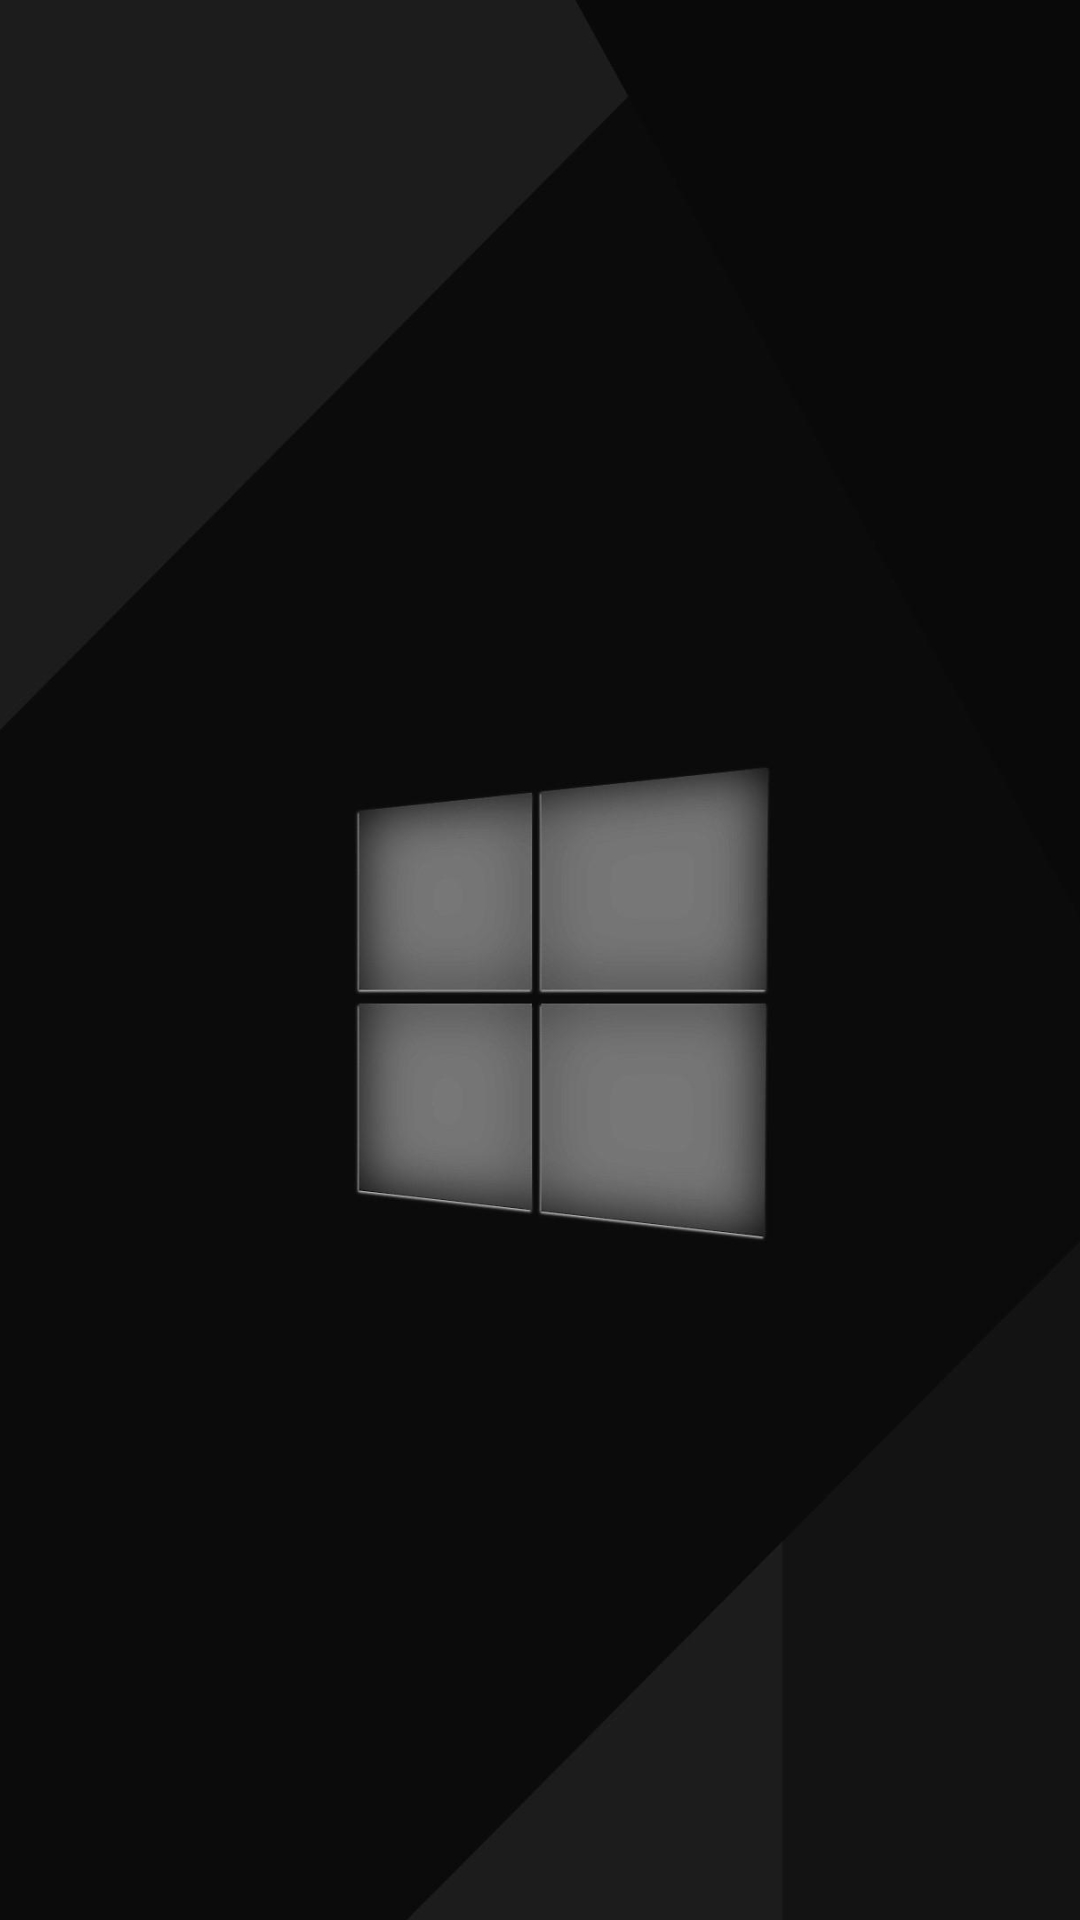 Windows 10 material design hd 4k wallpaper - Windows 10 4k wallpaper pack ...